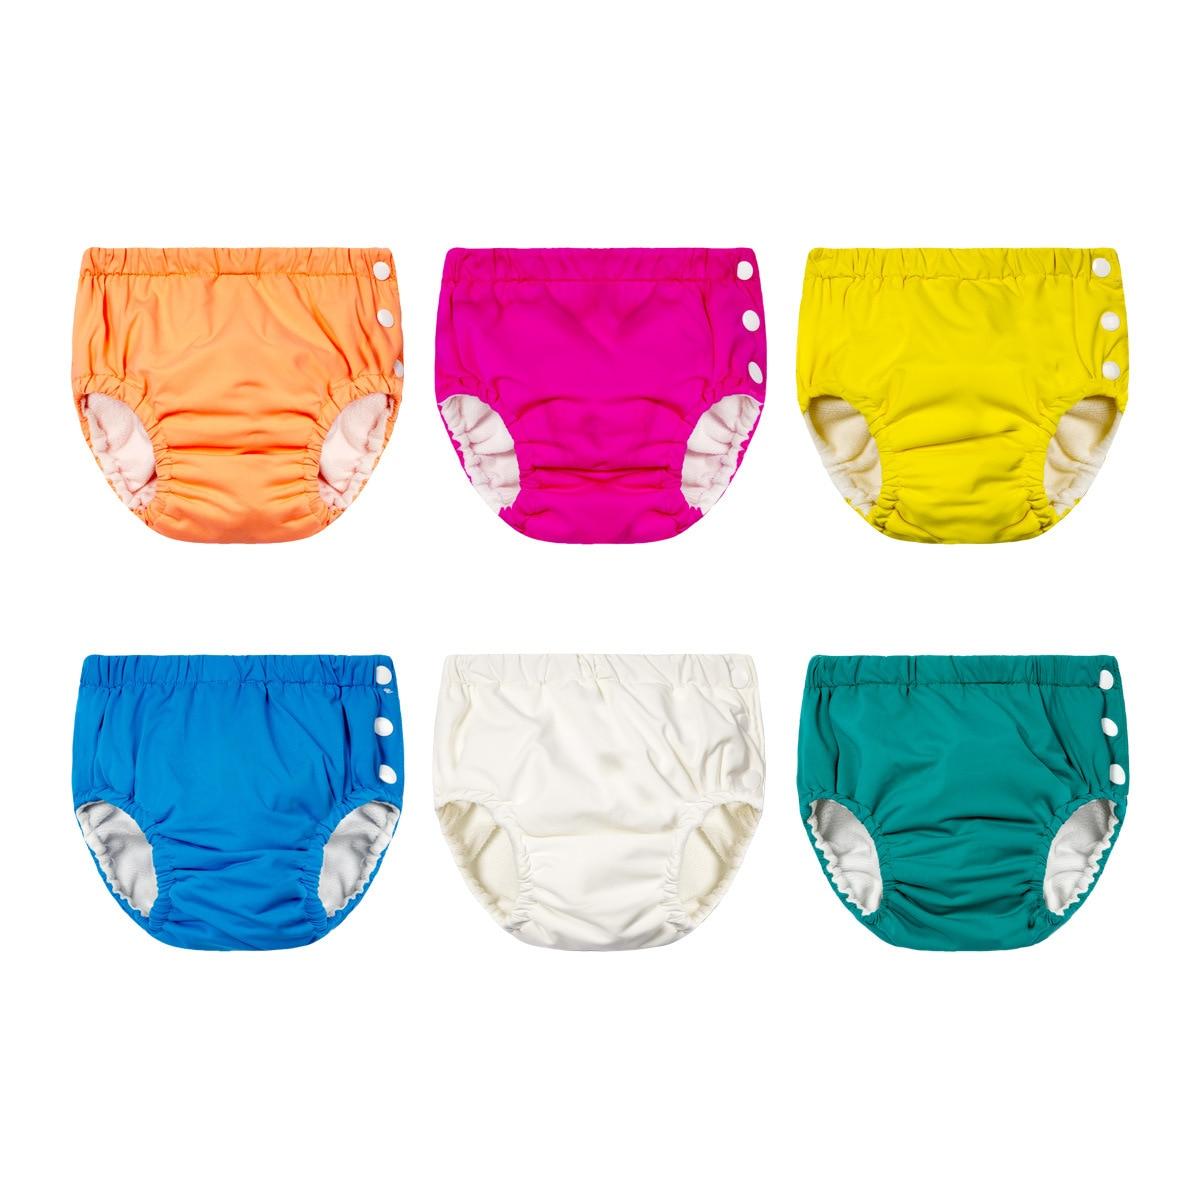 BABY'S Swimming Trunks Diaper Pants Washable Pocket Urine Learn Swimming Trunks Kids Training Pants Swimming Pool Baby Swimming